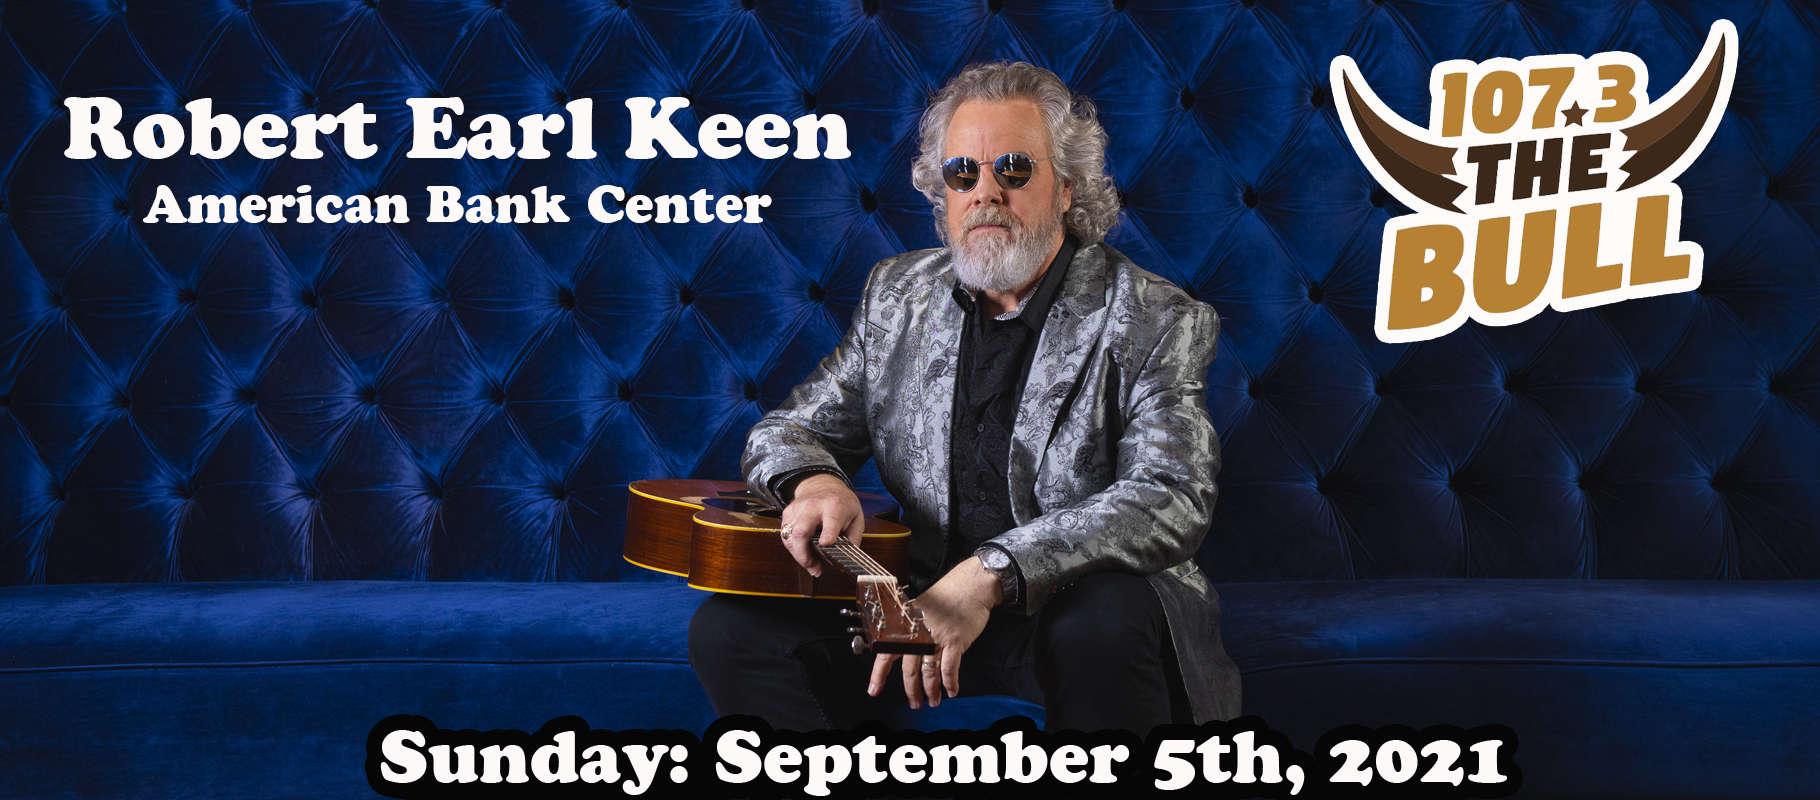 Robert Earl Keen Feelin' Good Again Tour